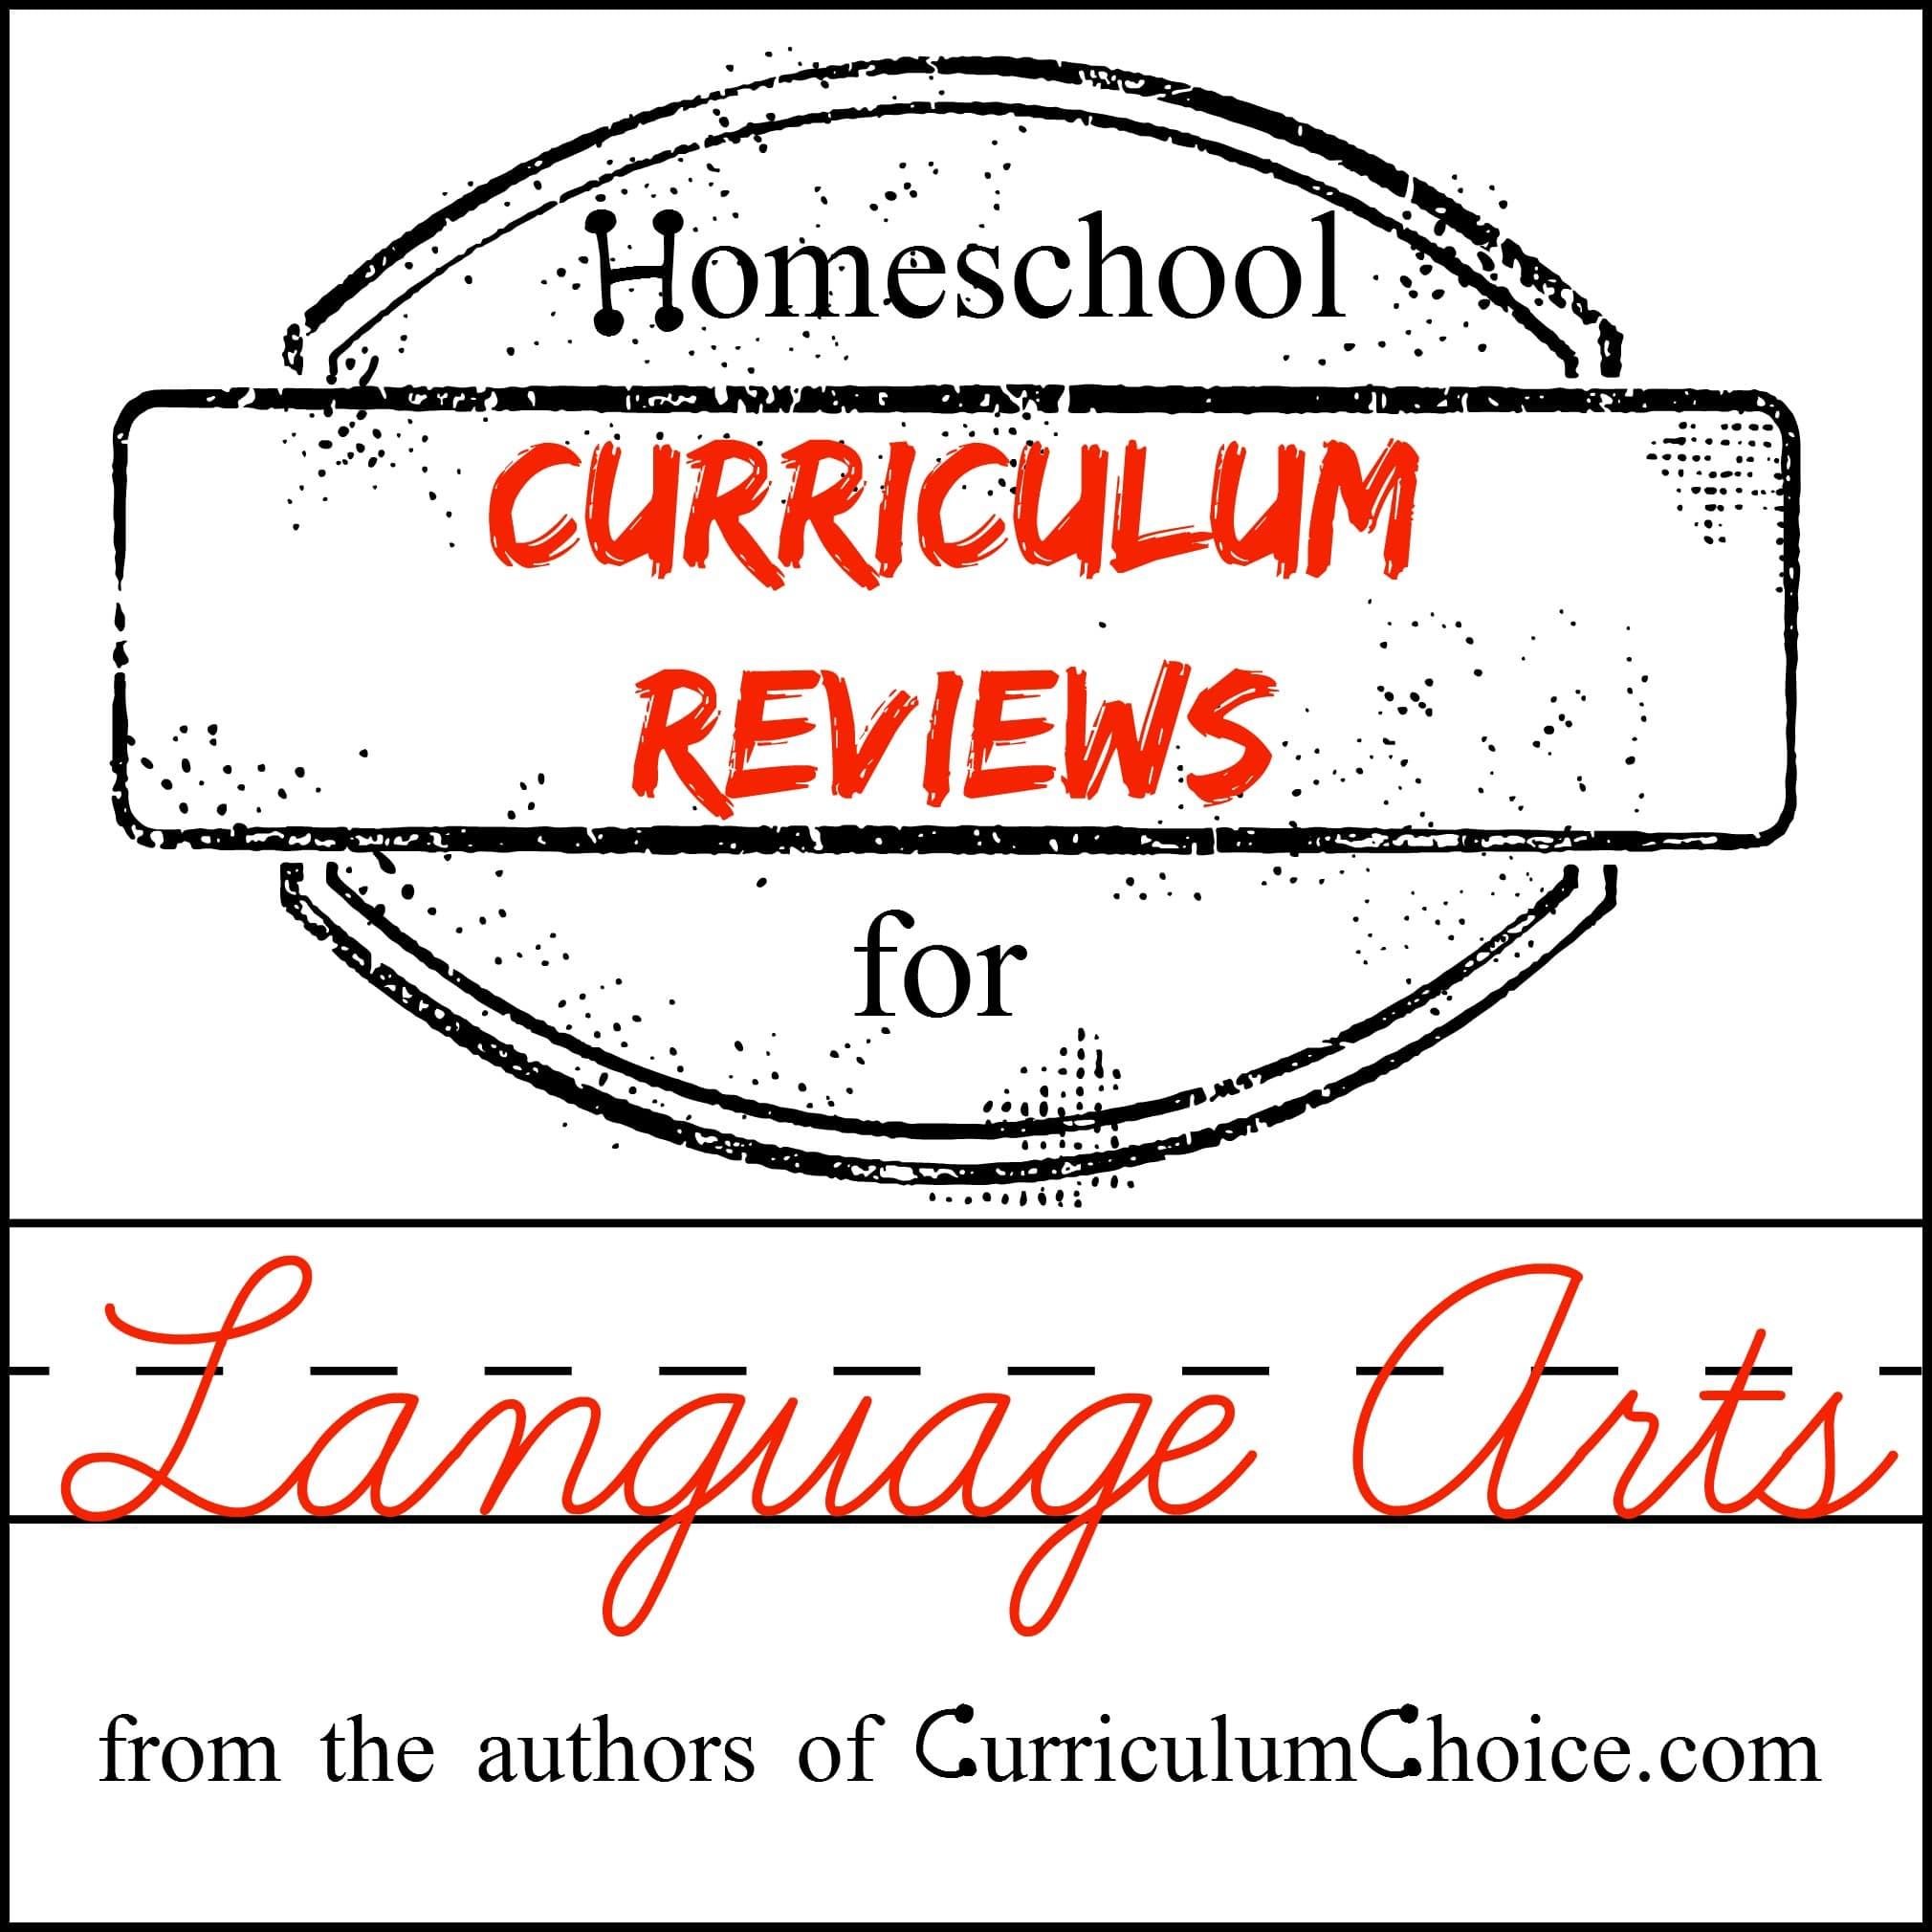 homeschool language arts curriculum reviews the curriculum choice